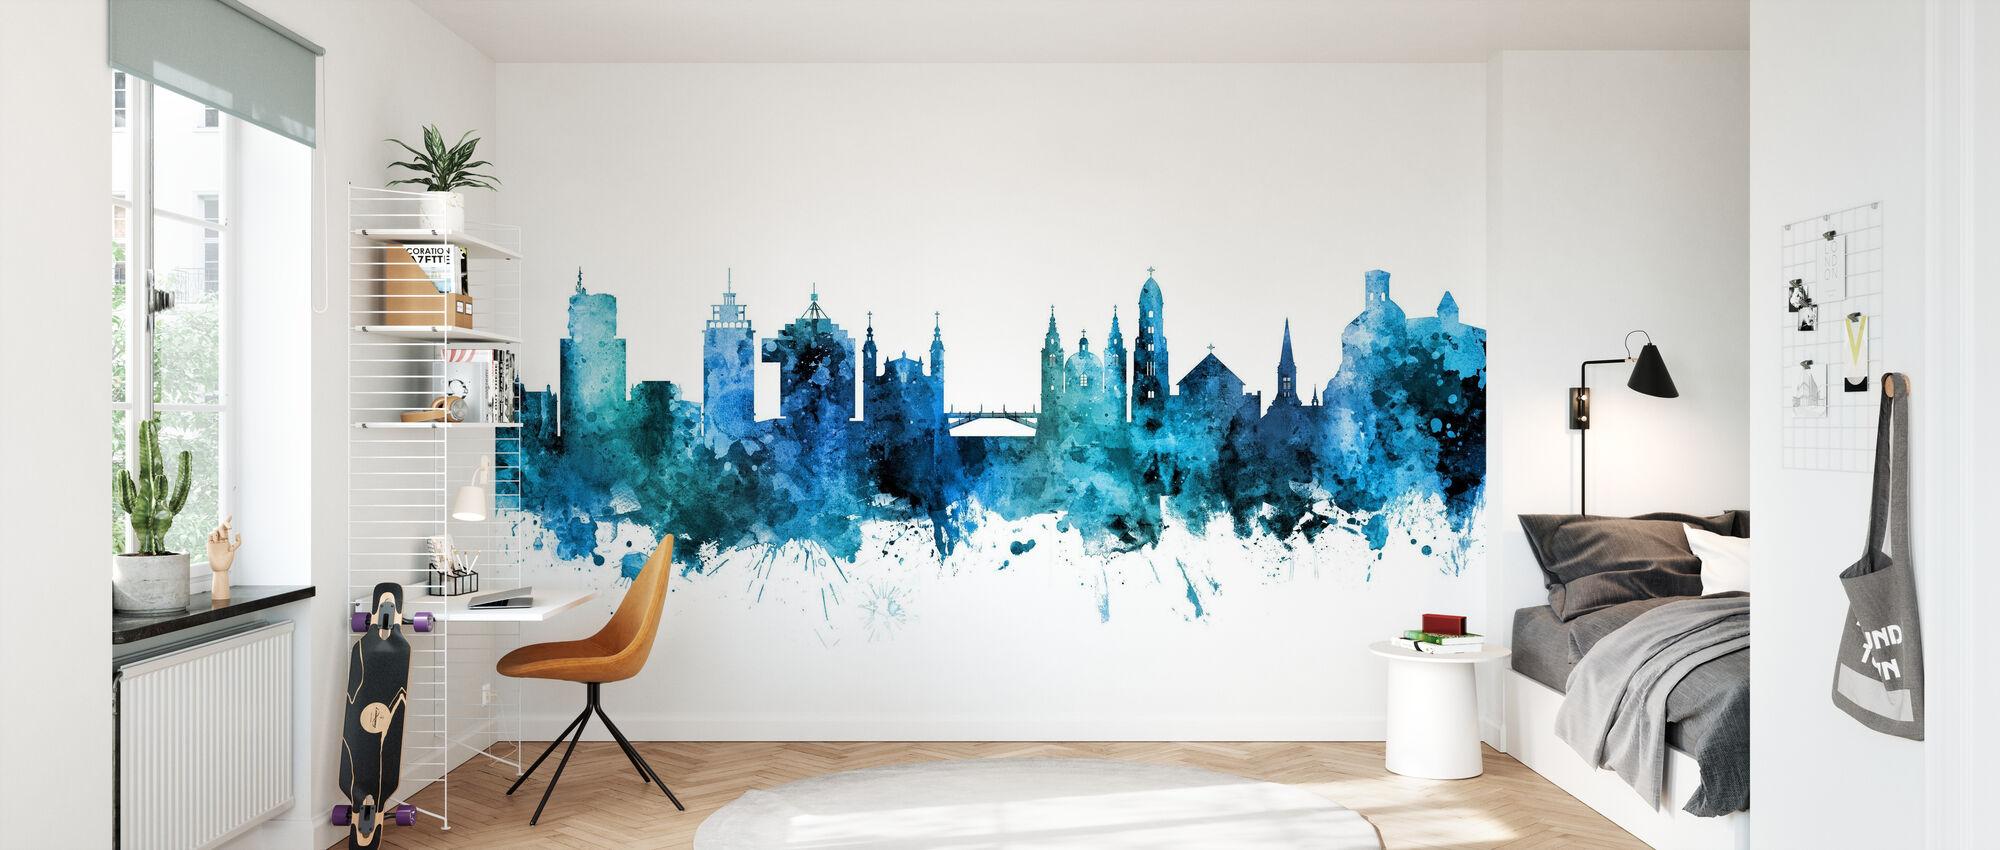 Ljubljana Solvenia Skyline - Wallpaper - Kids Room